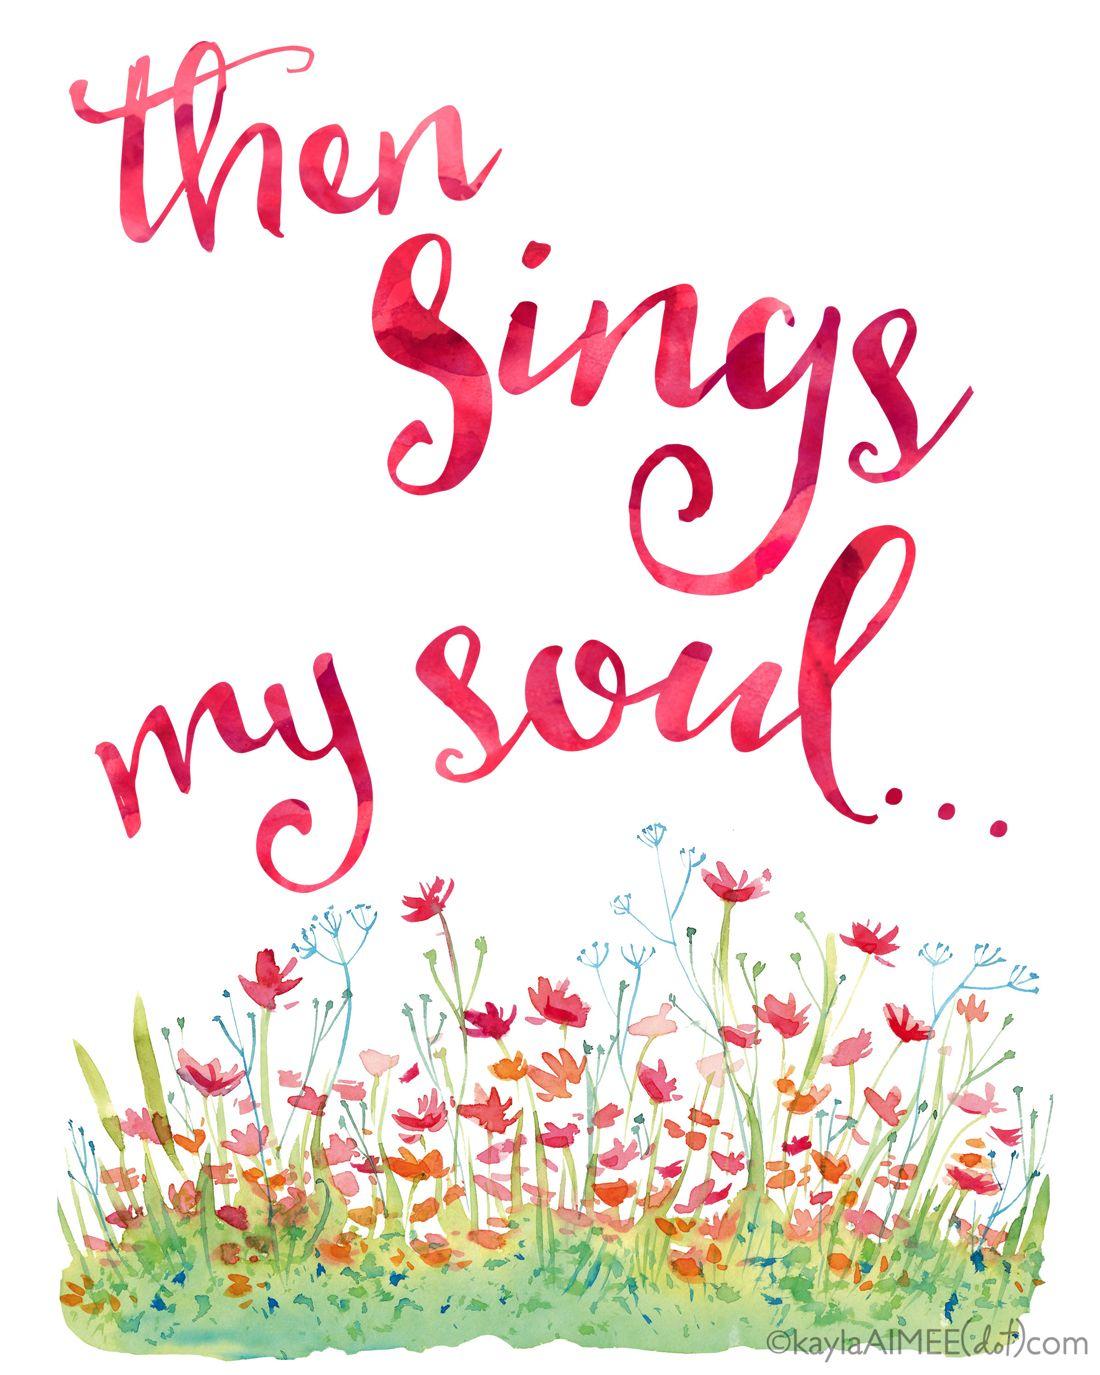 Free 8x10 Hymn Printable Art: Then Sings My Soul - so pretty for spring!